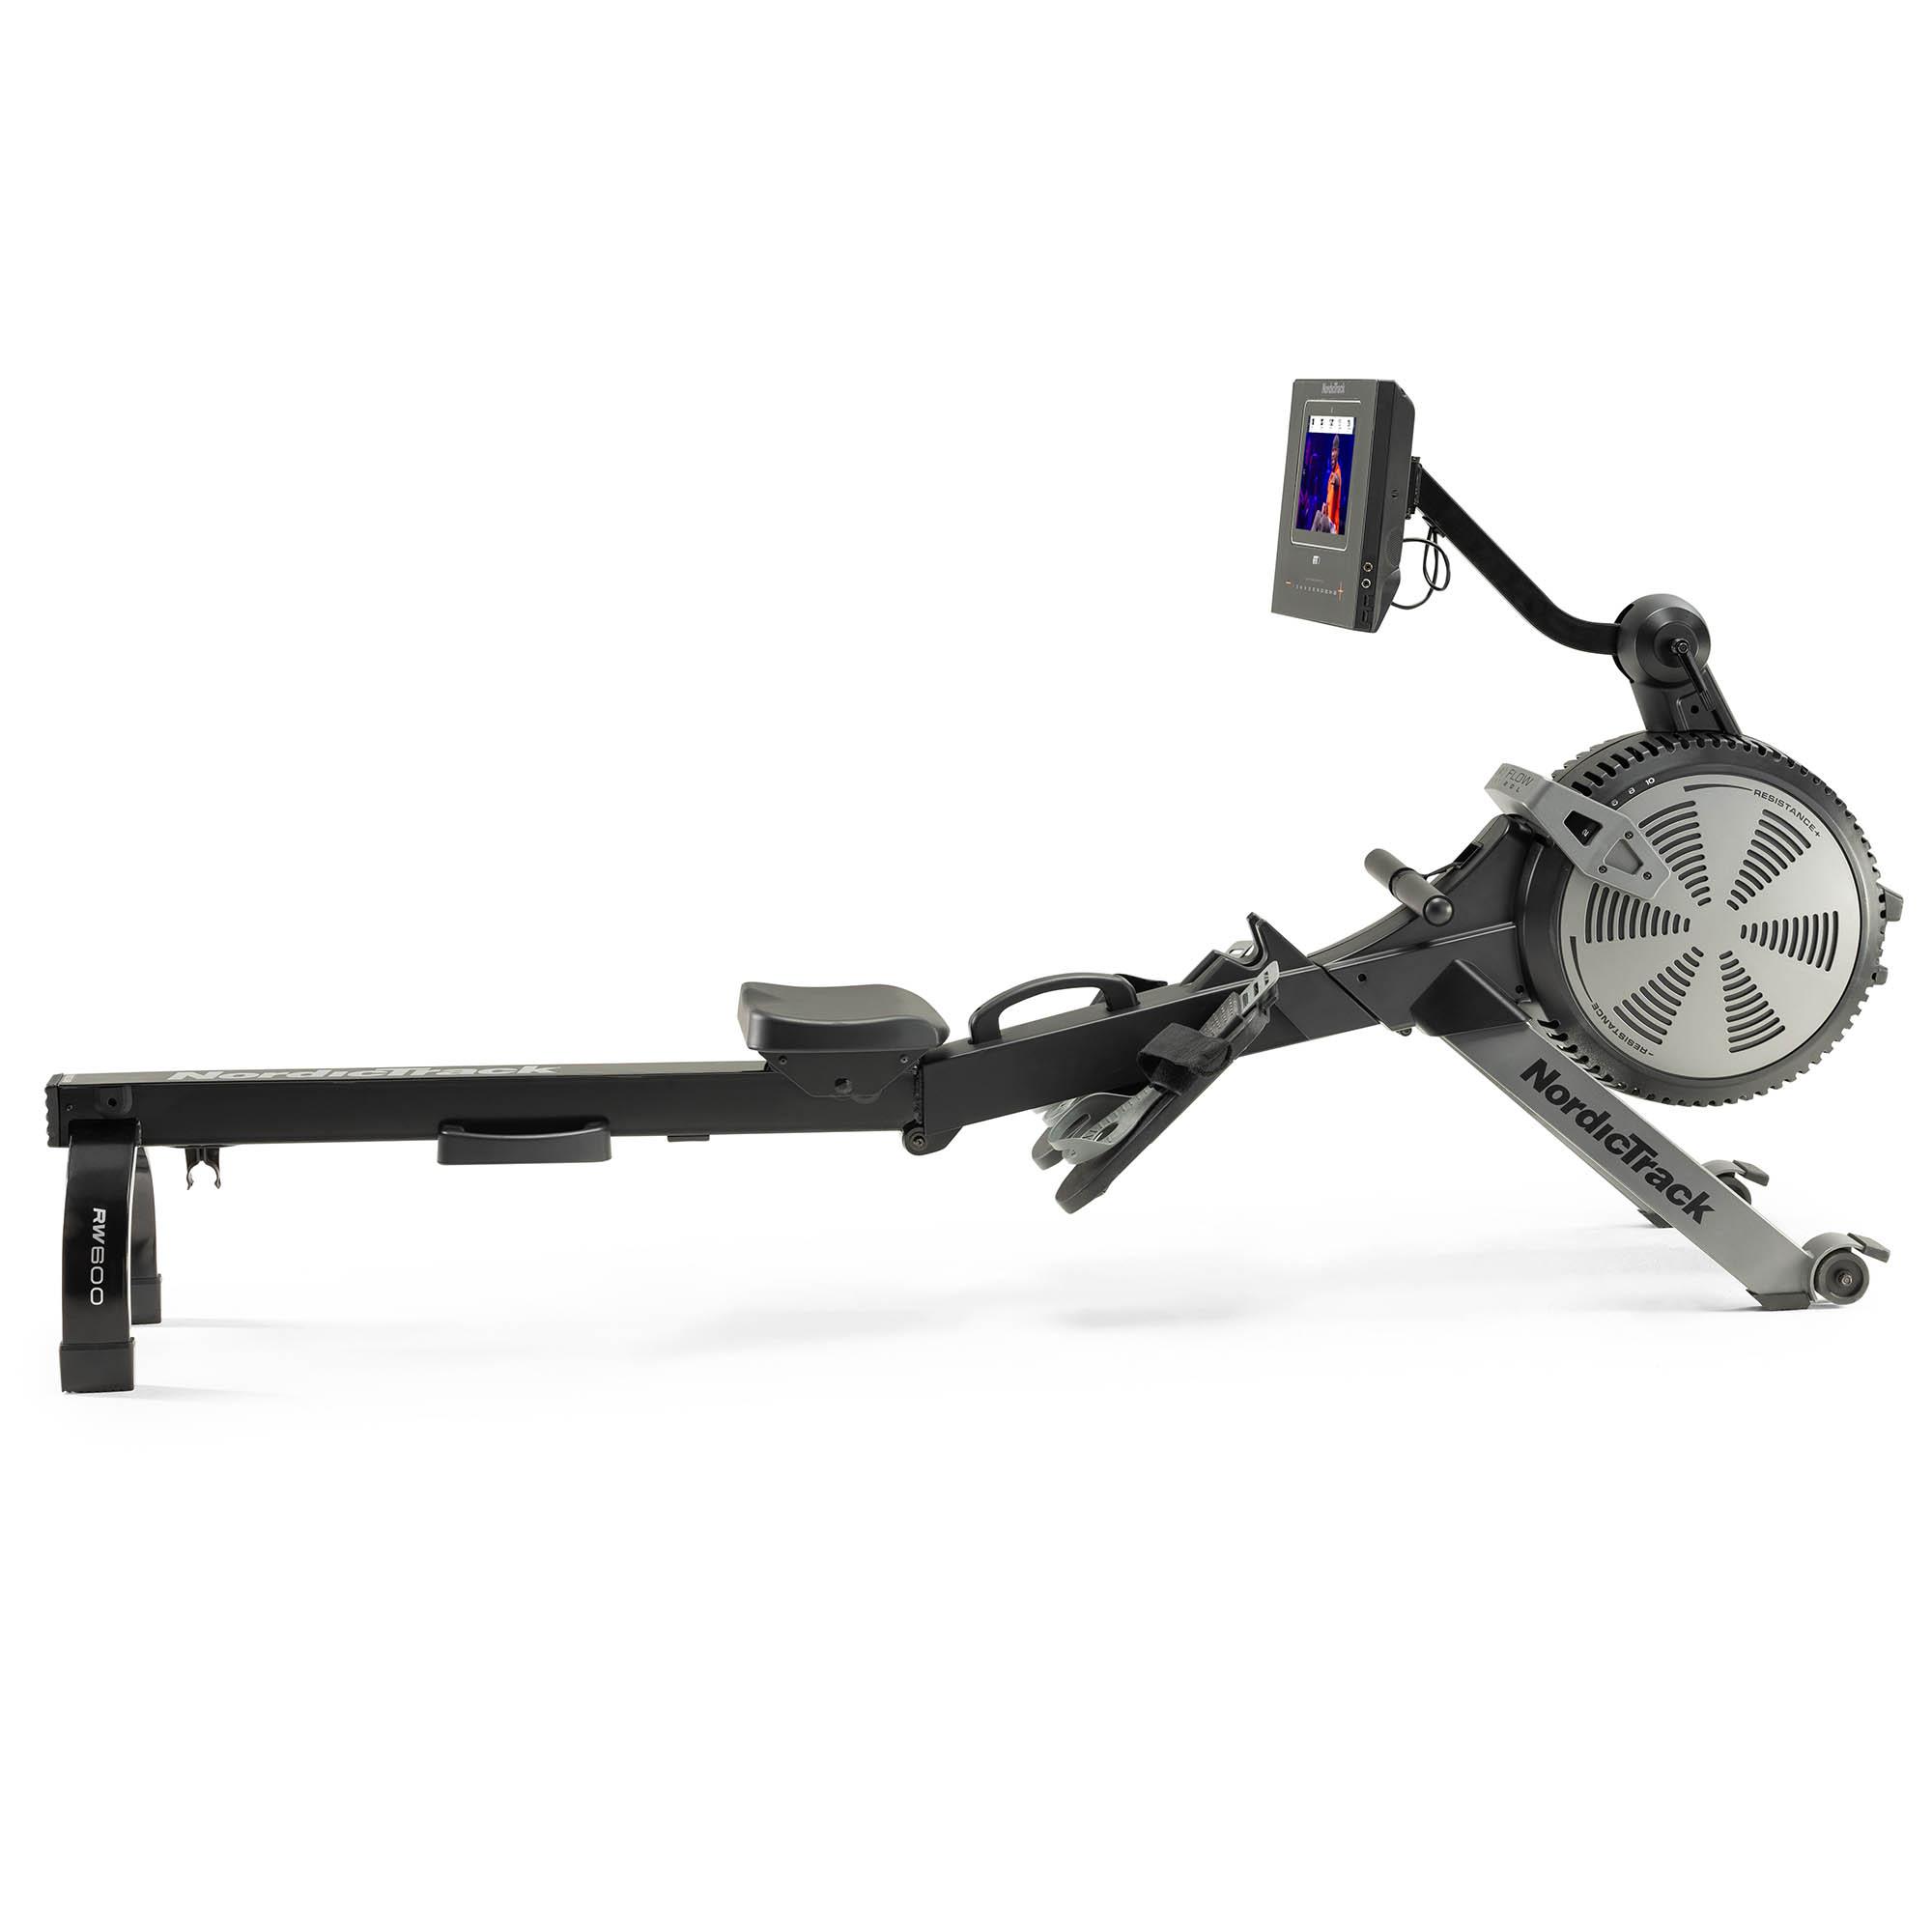 Fitness Equipment NordicTrack RW600 Rowing Machine